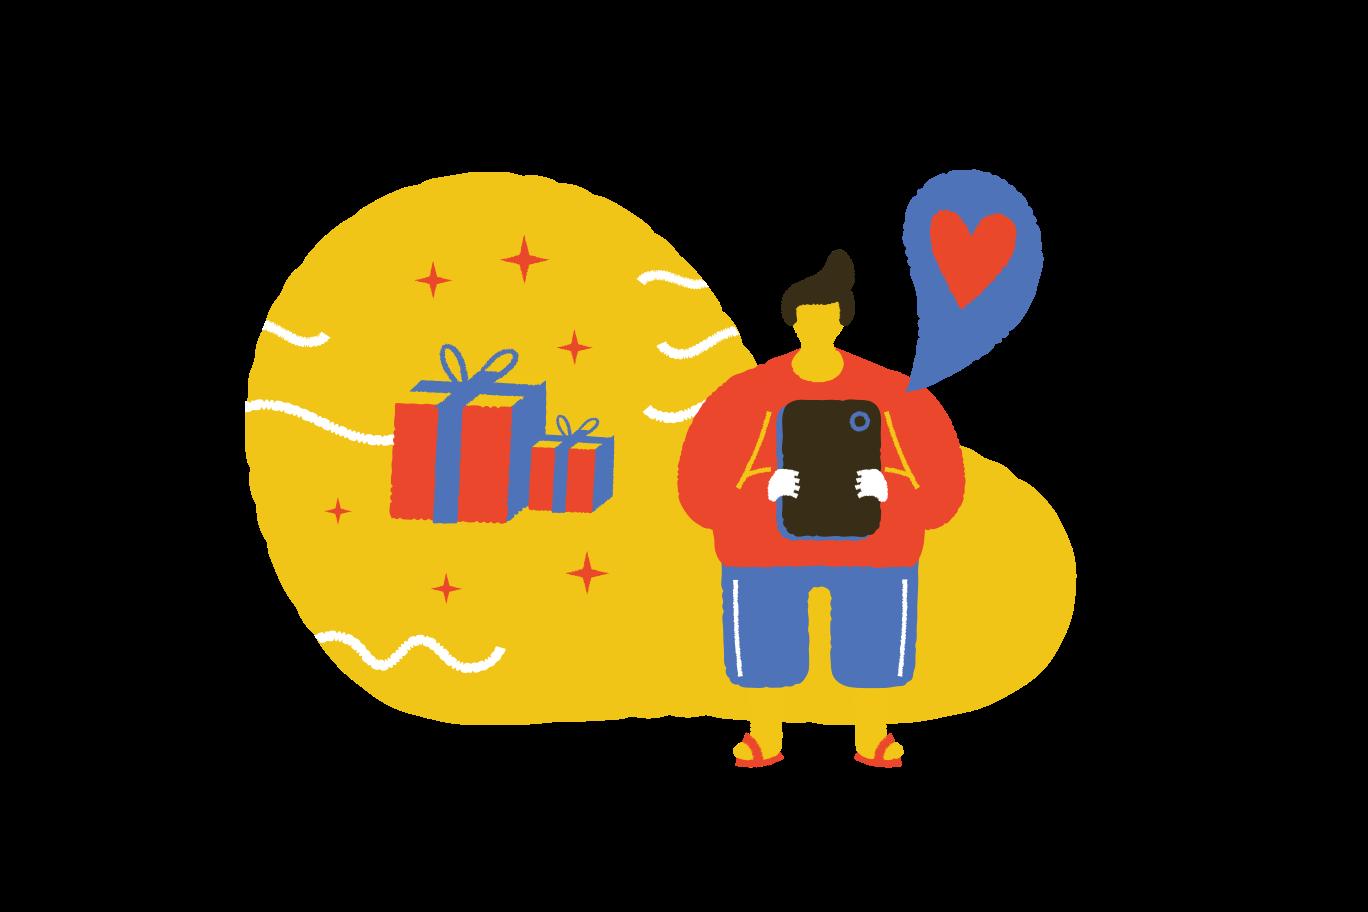 Sending the gift  Clipart illustration in PNG, SVG